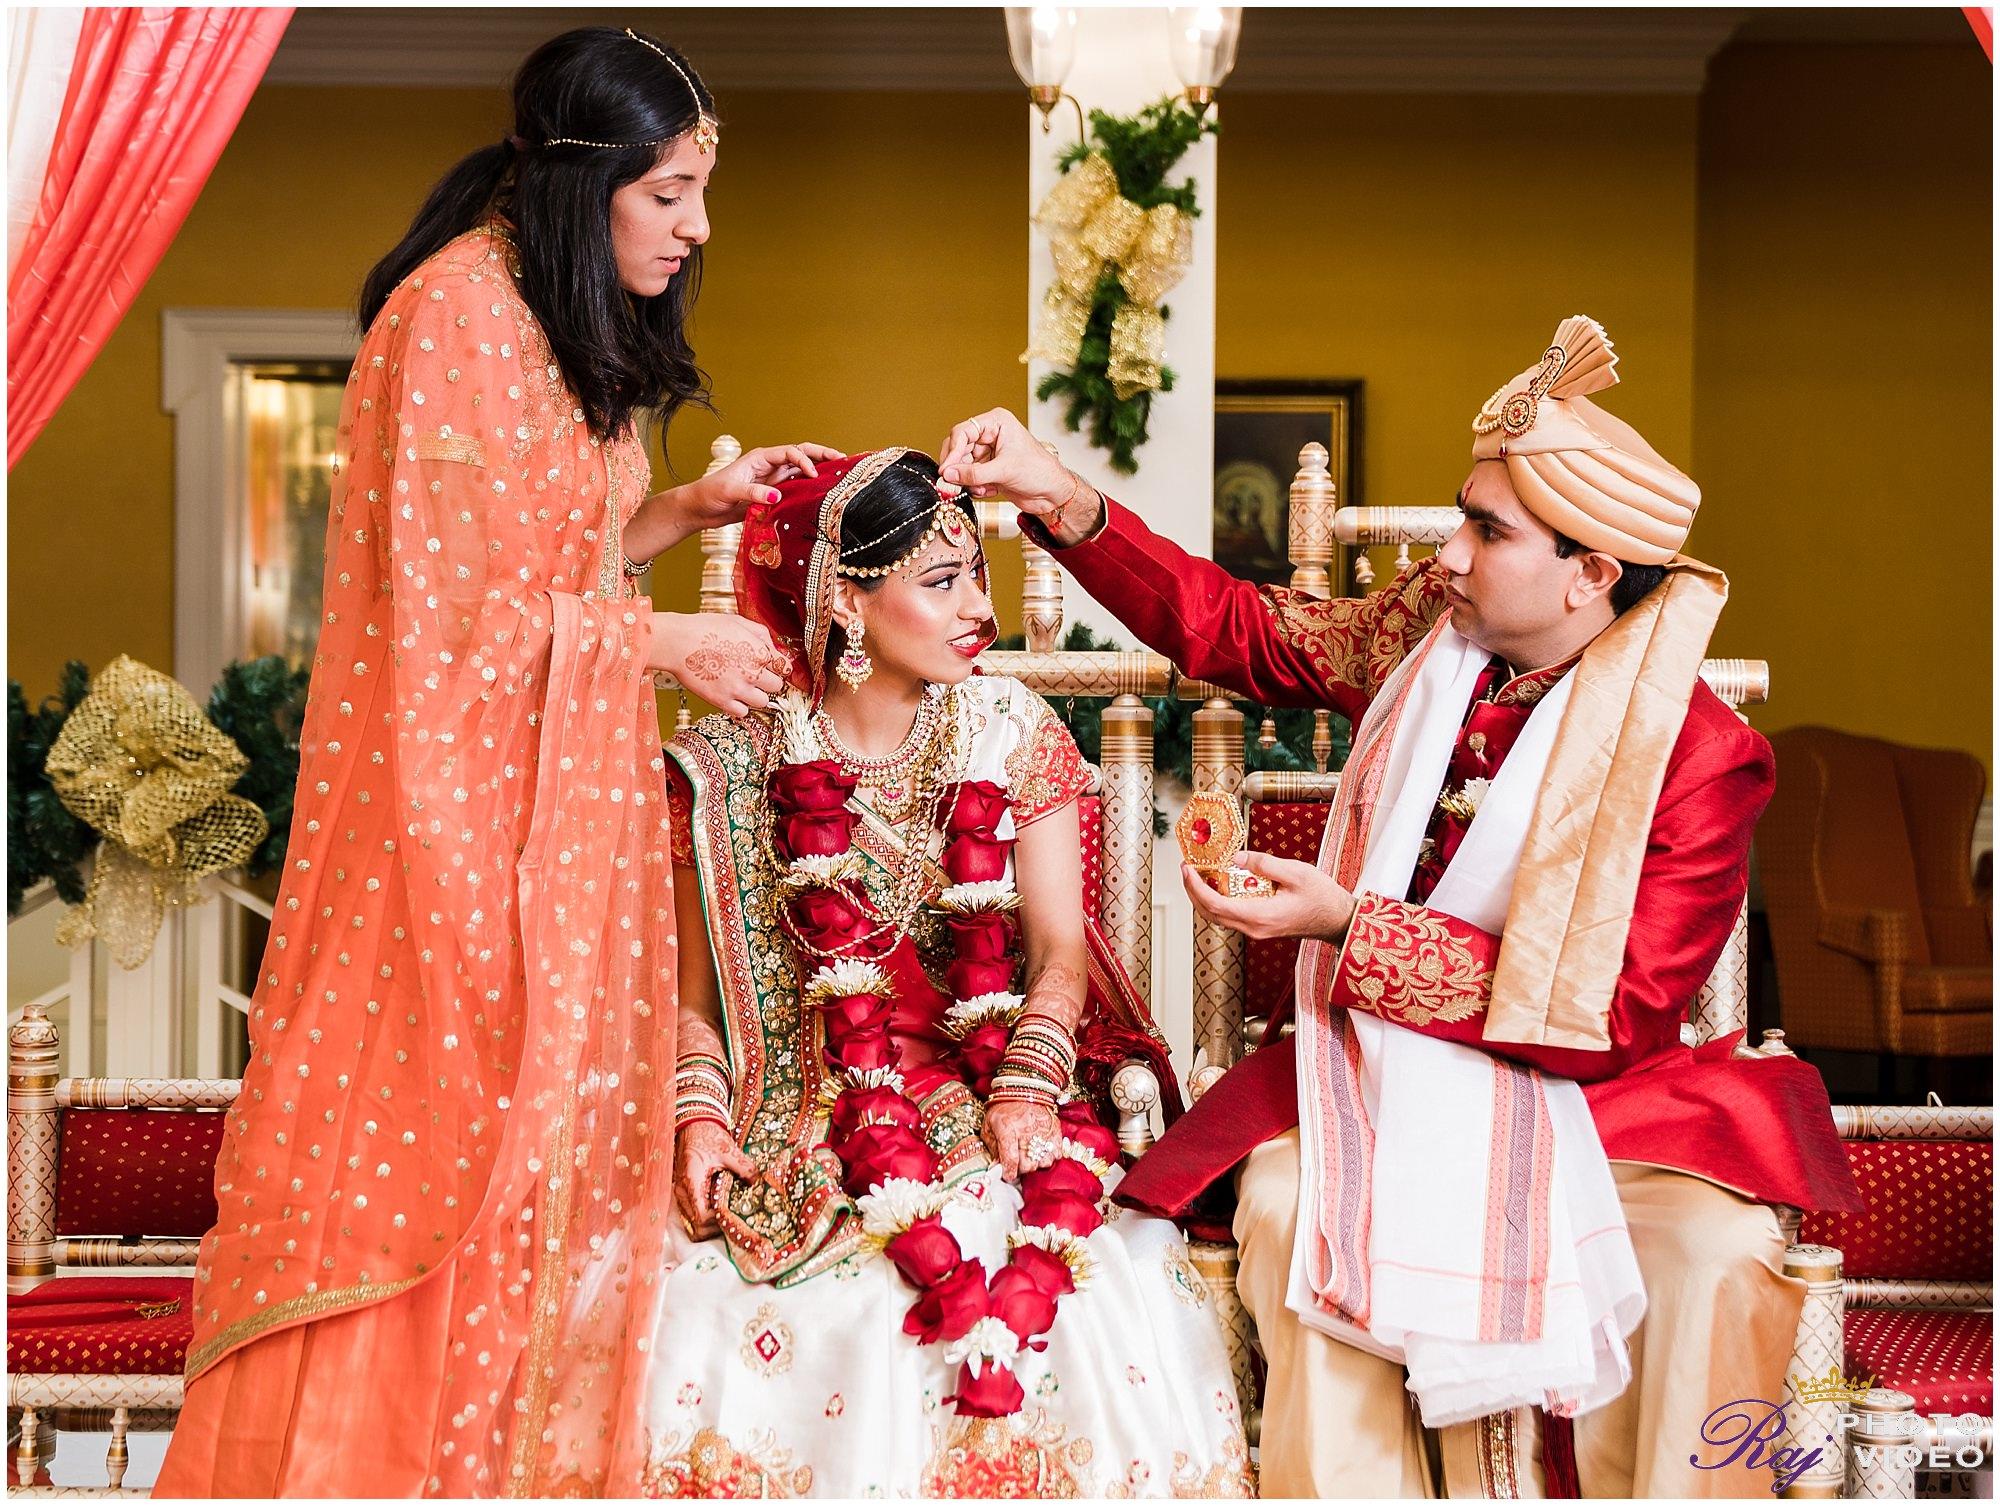 Founders-Inn-and-Spa-Virginia-Beach-VA-Indian-Wedding-Harini-Vivek-45.jpg